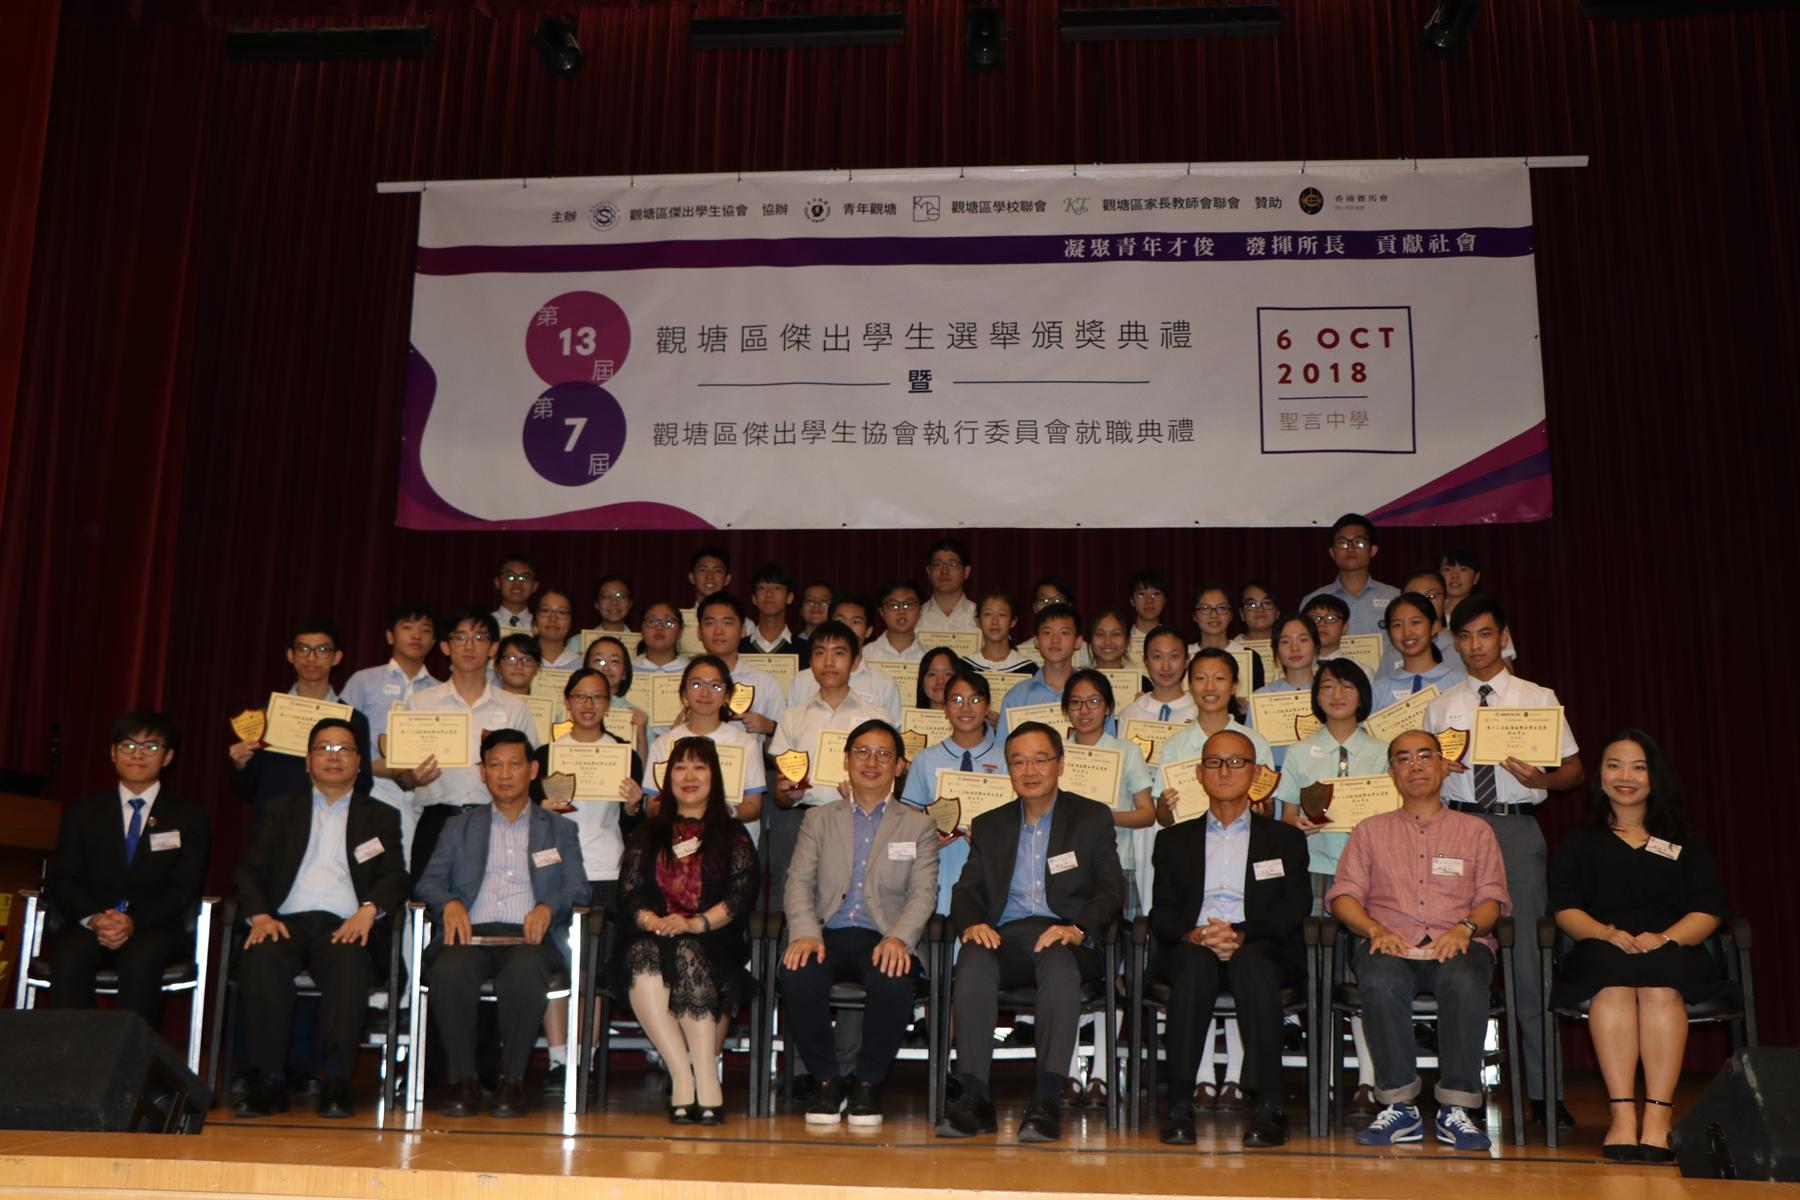 http://npc.edu.hk/sites/default/files/img_5758.jpg